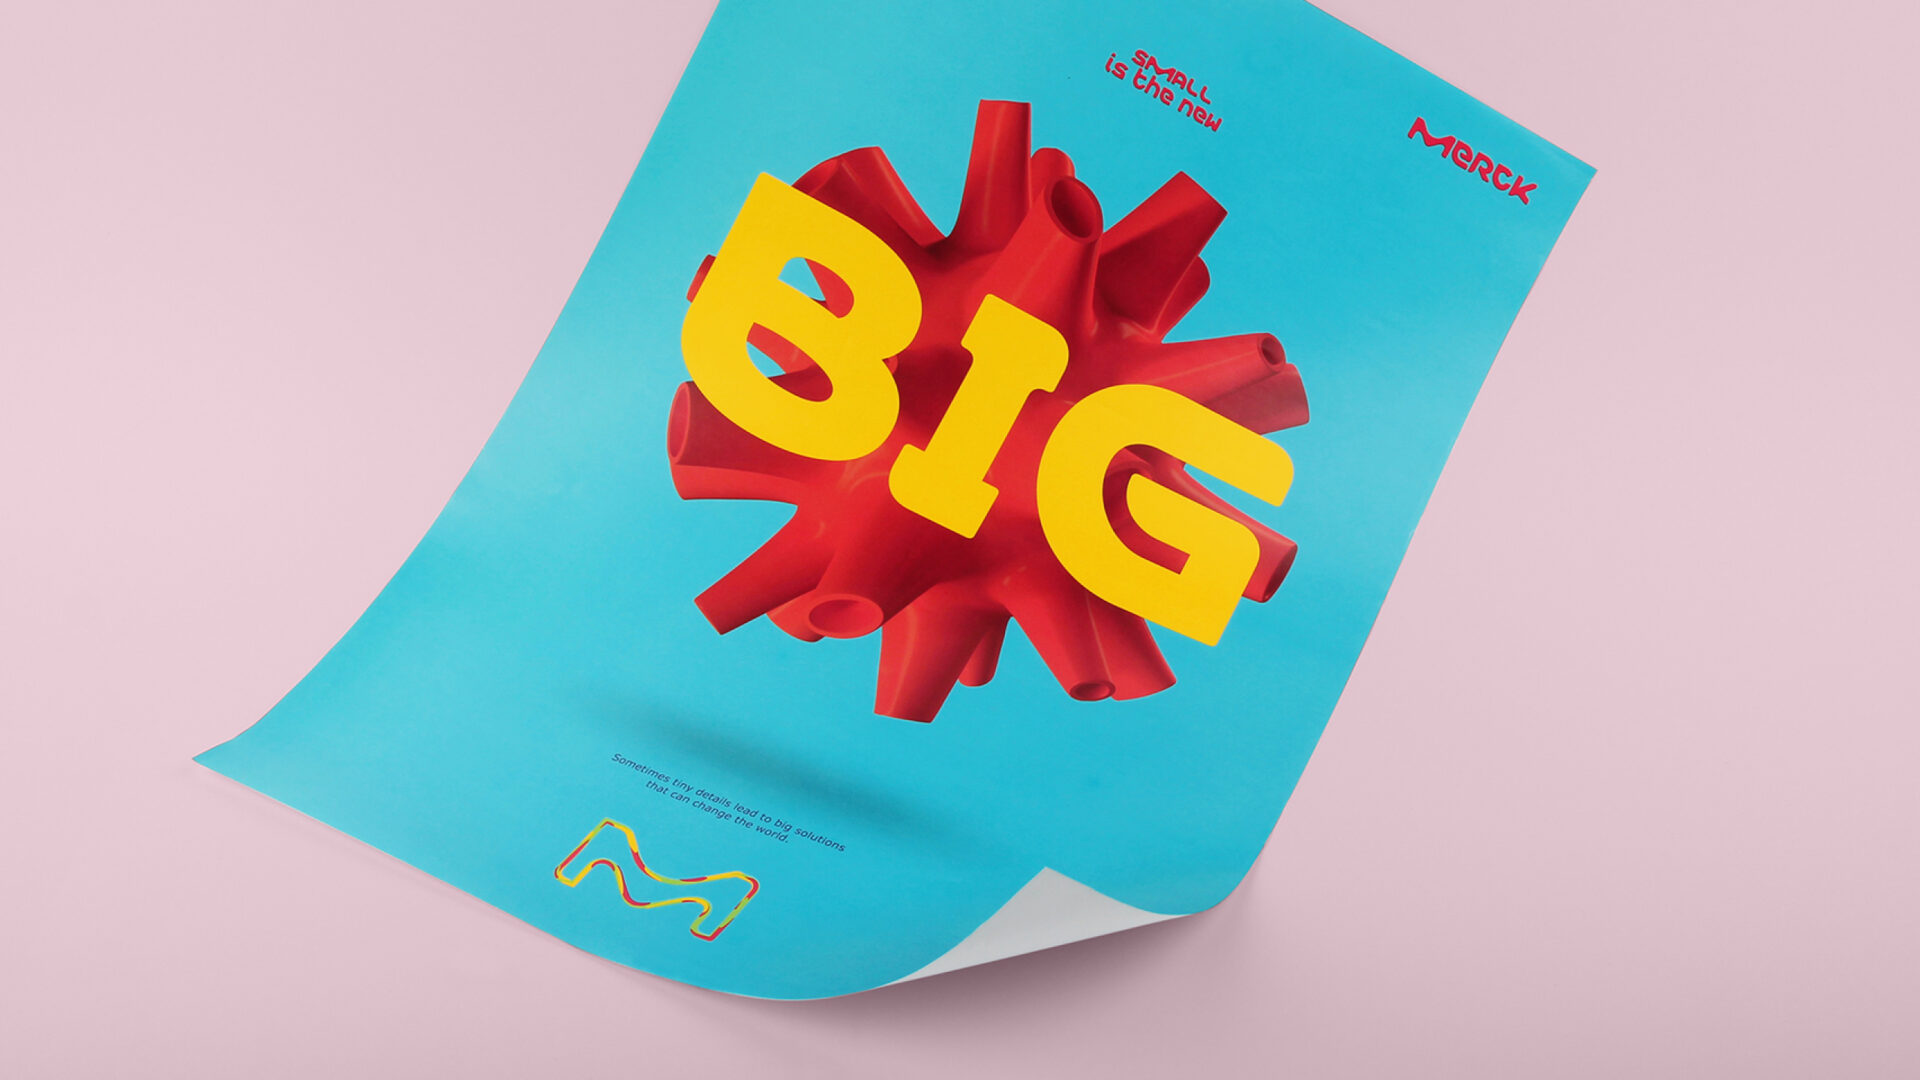 Merck IBI Poster Big